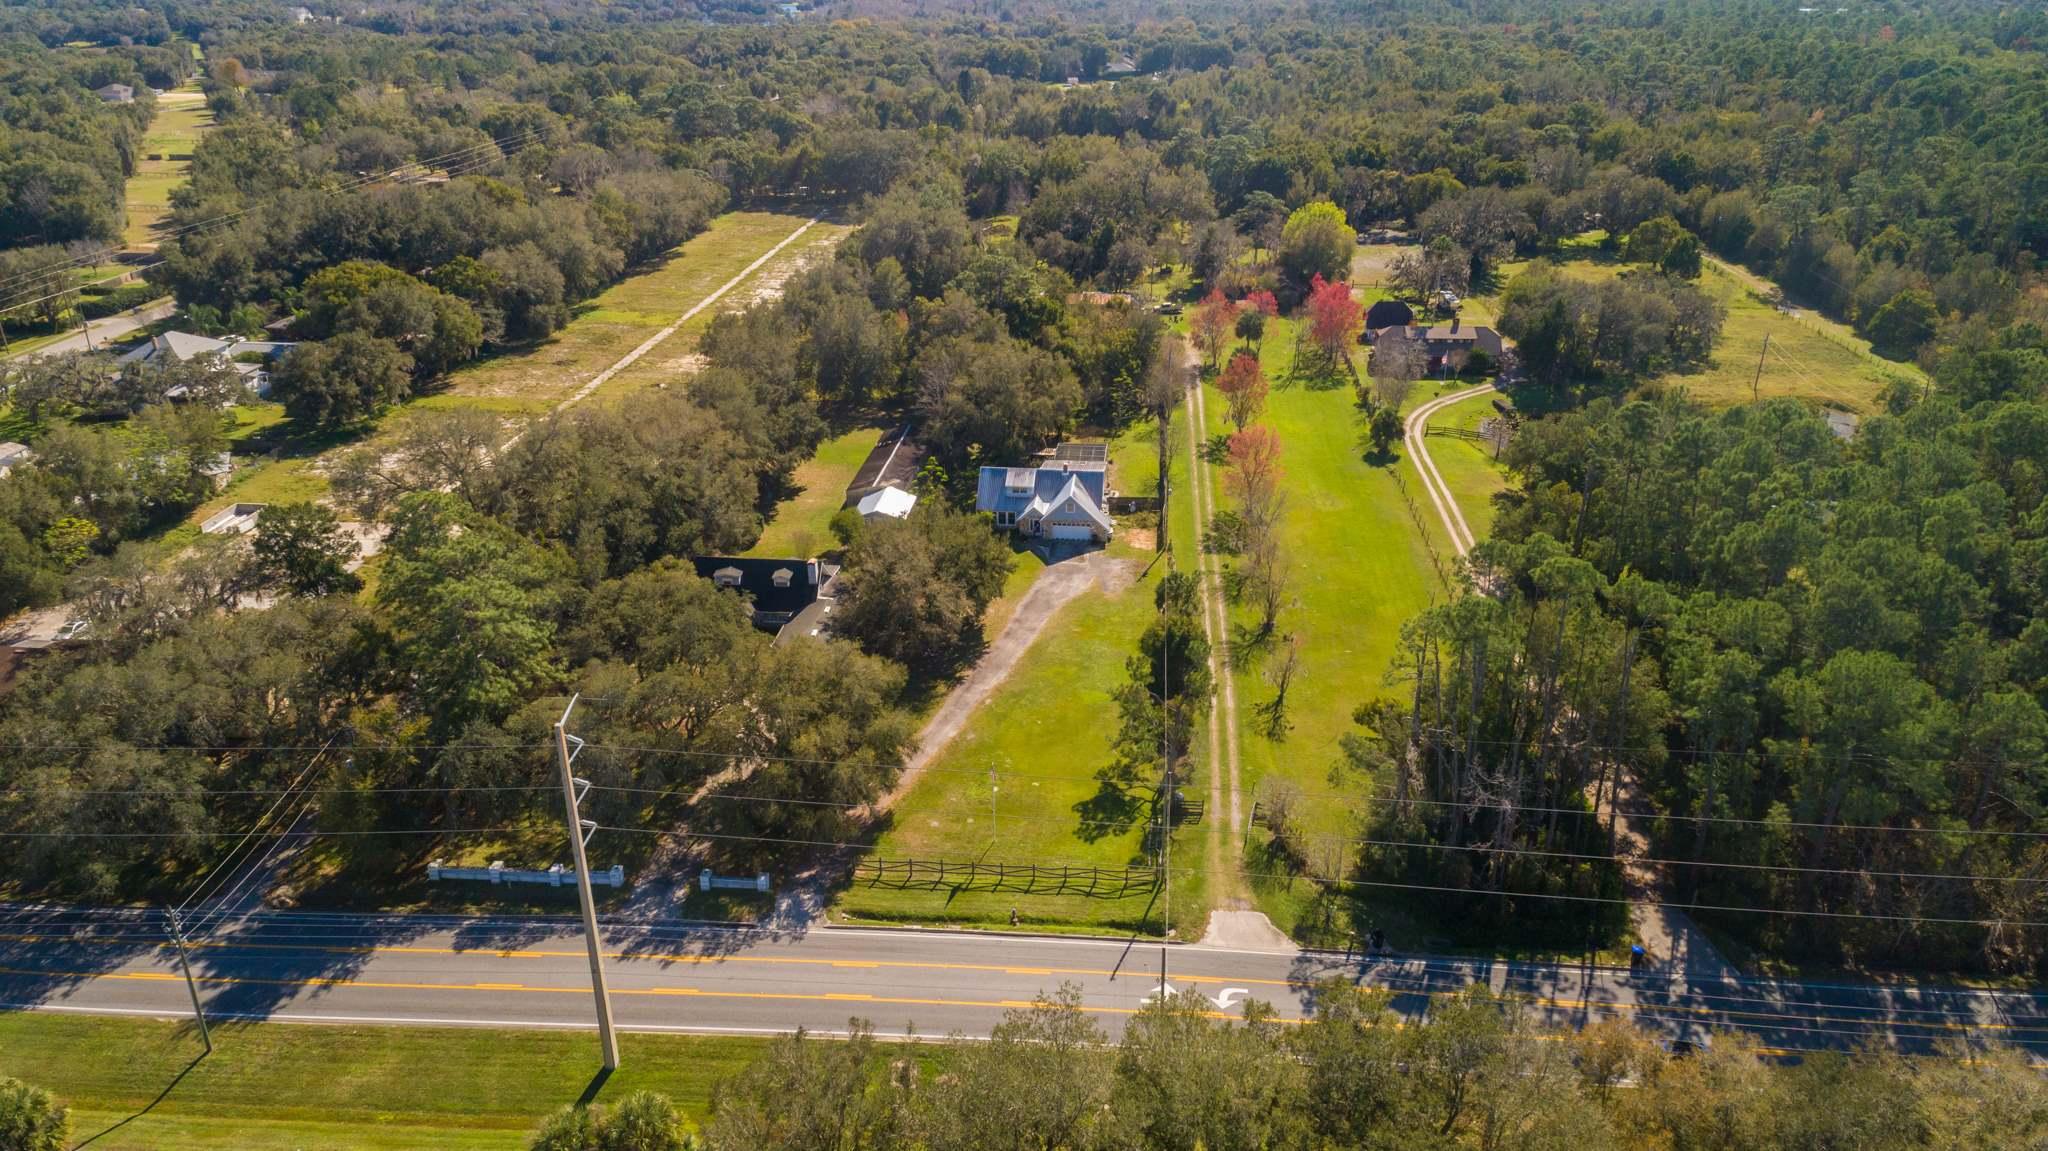 404 East Welch Road, Apopka, FL 32712